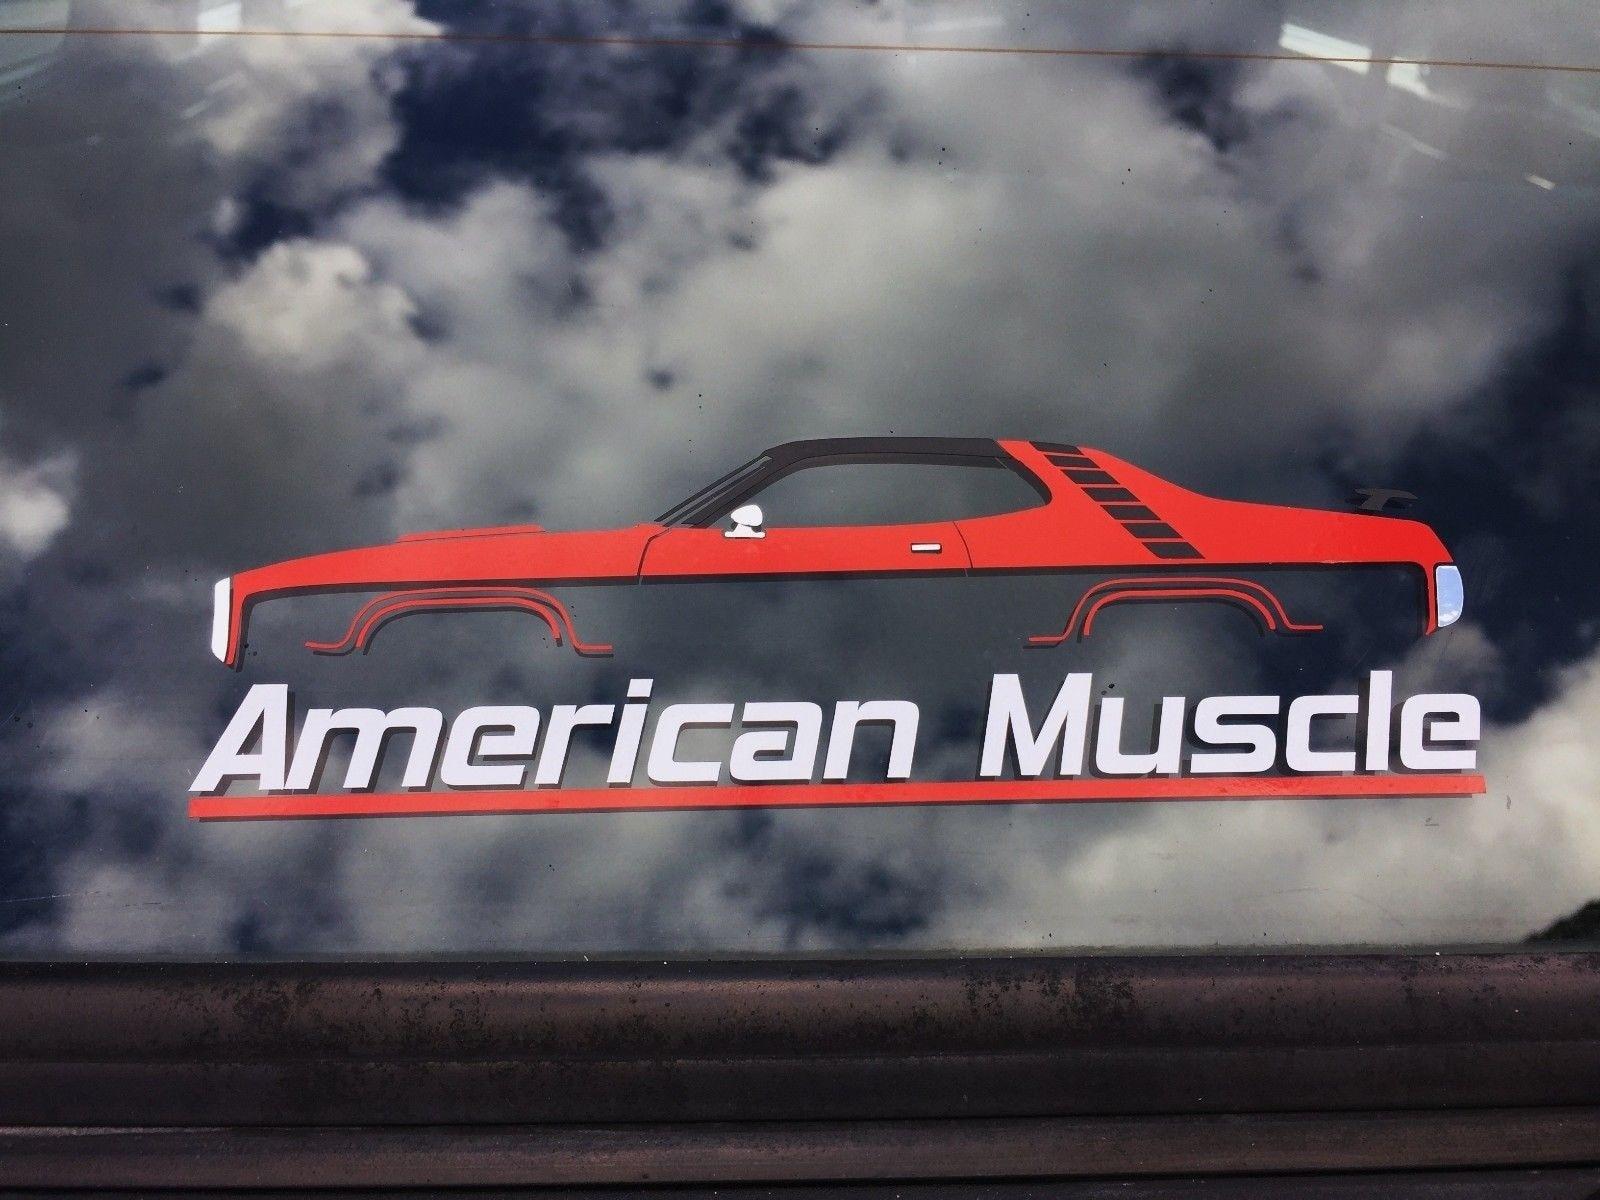 Adesivos de carro Músculo Americano janela silhueta adesivo para 1971 Plymouth Road runner adesivo 20 cm